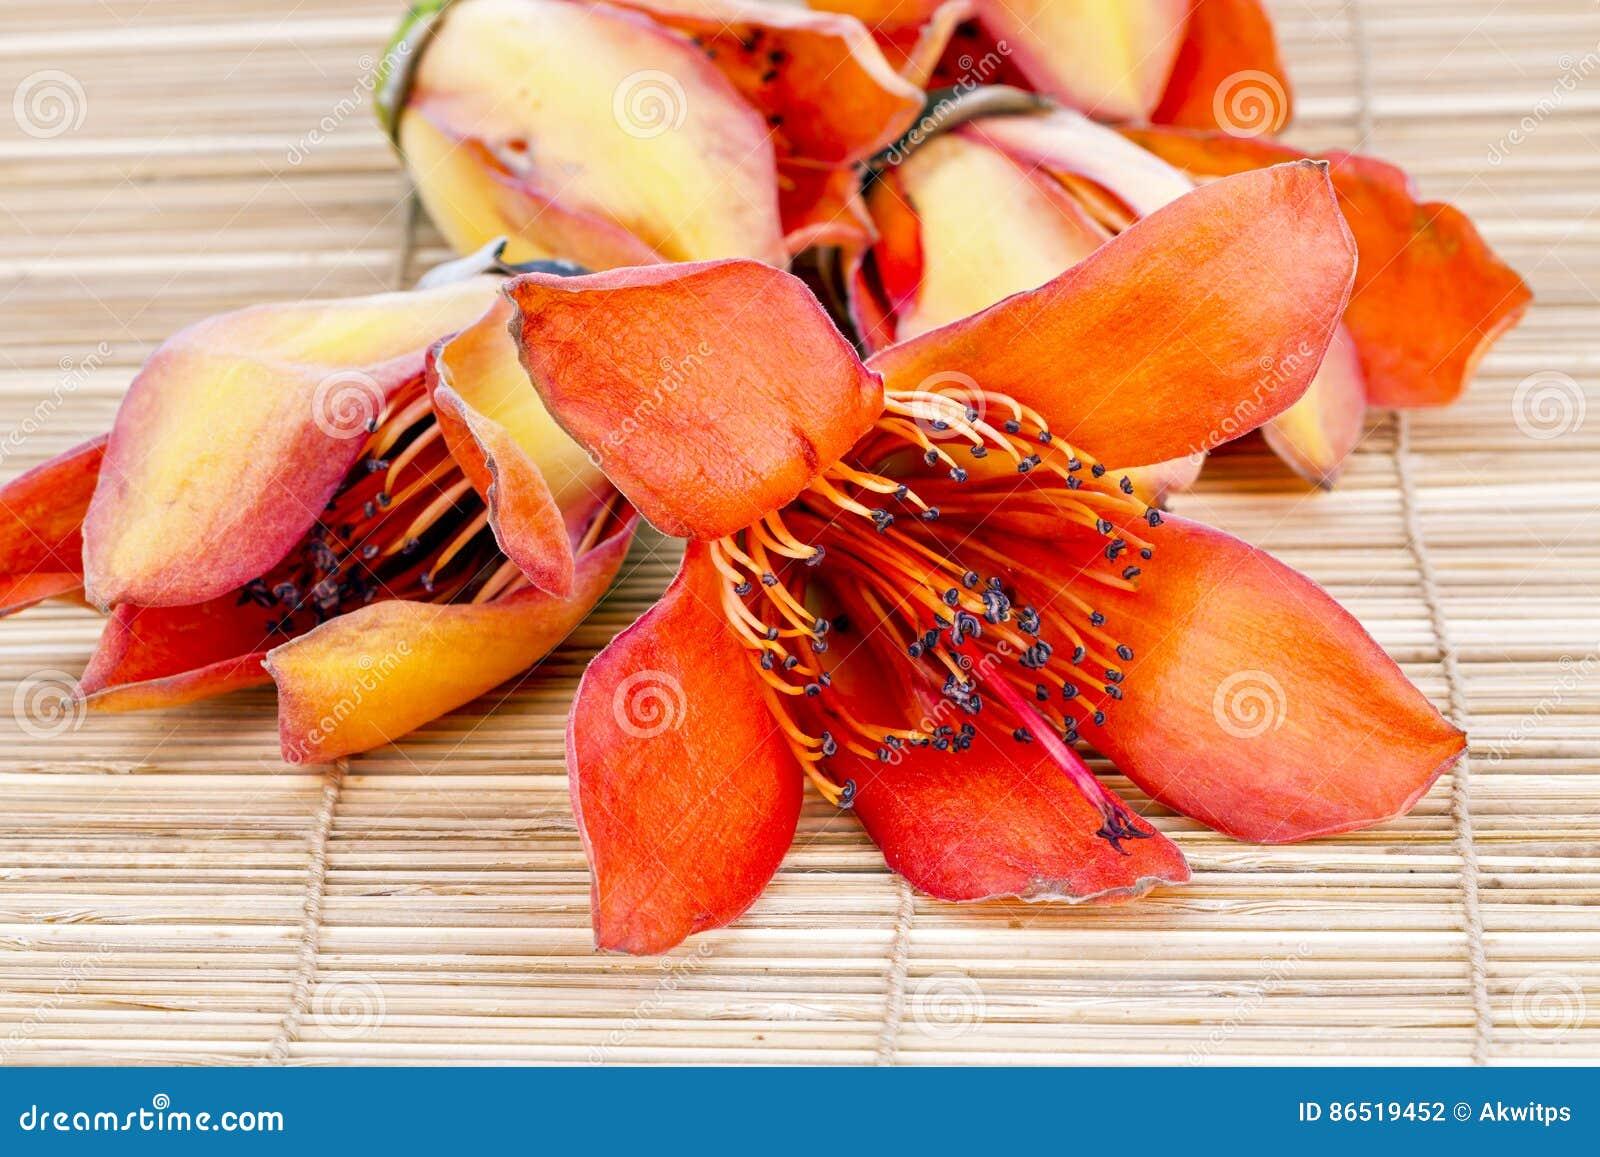 Flower Of Fresh BOMBAX CEIBA LINN - Prepare For Drying Androecium